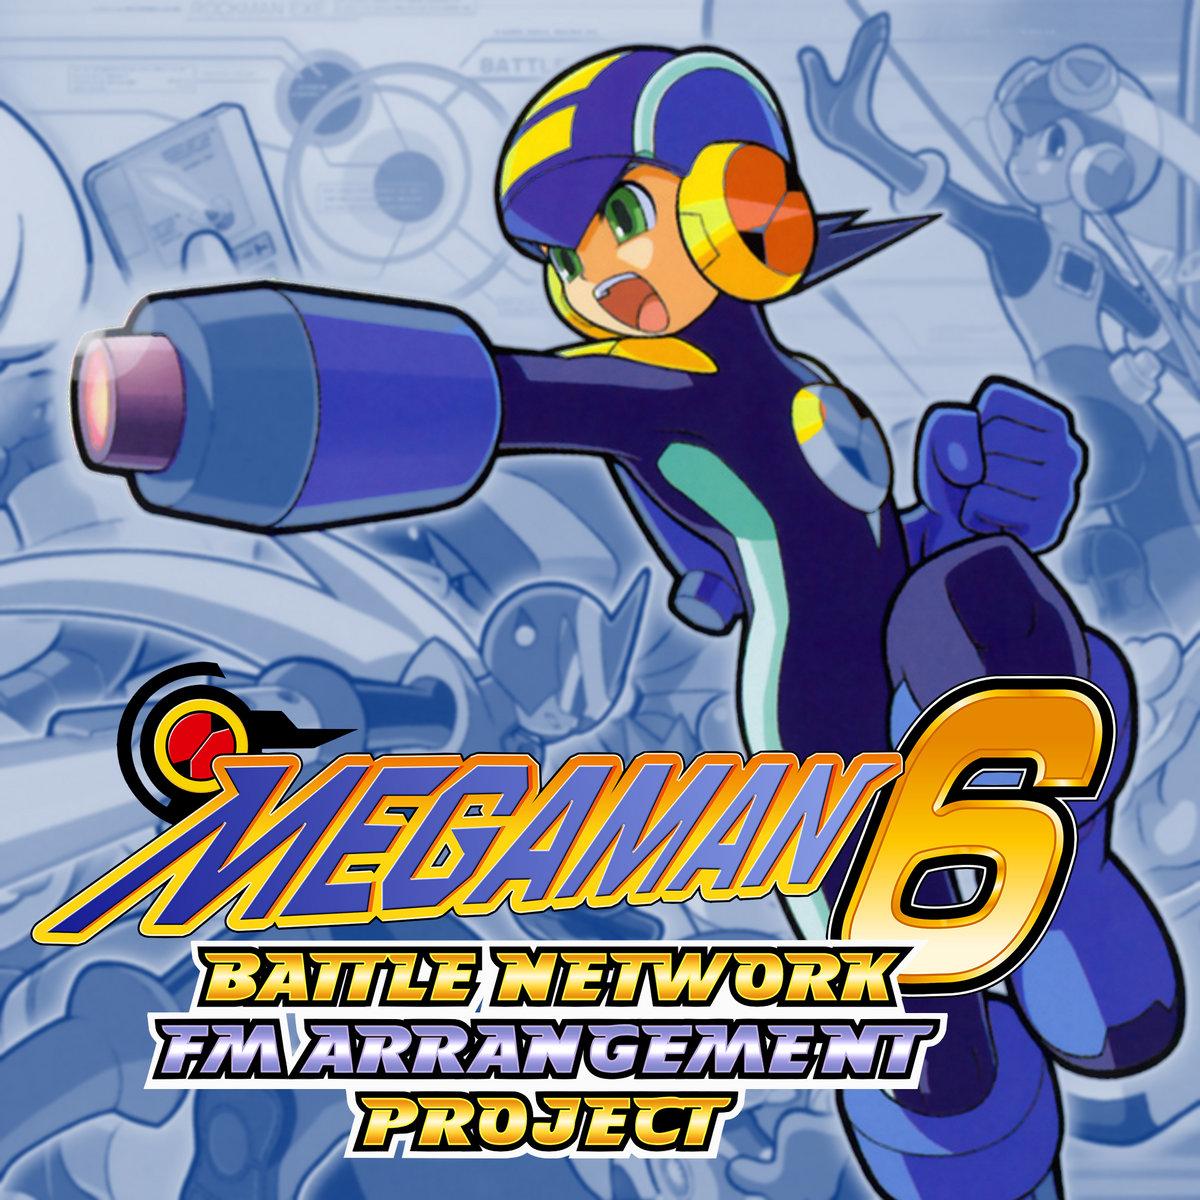 Mega Man Battle Network 6 FM ARRANGEMENT PROJECT   +TEK